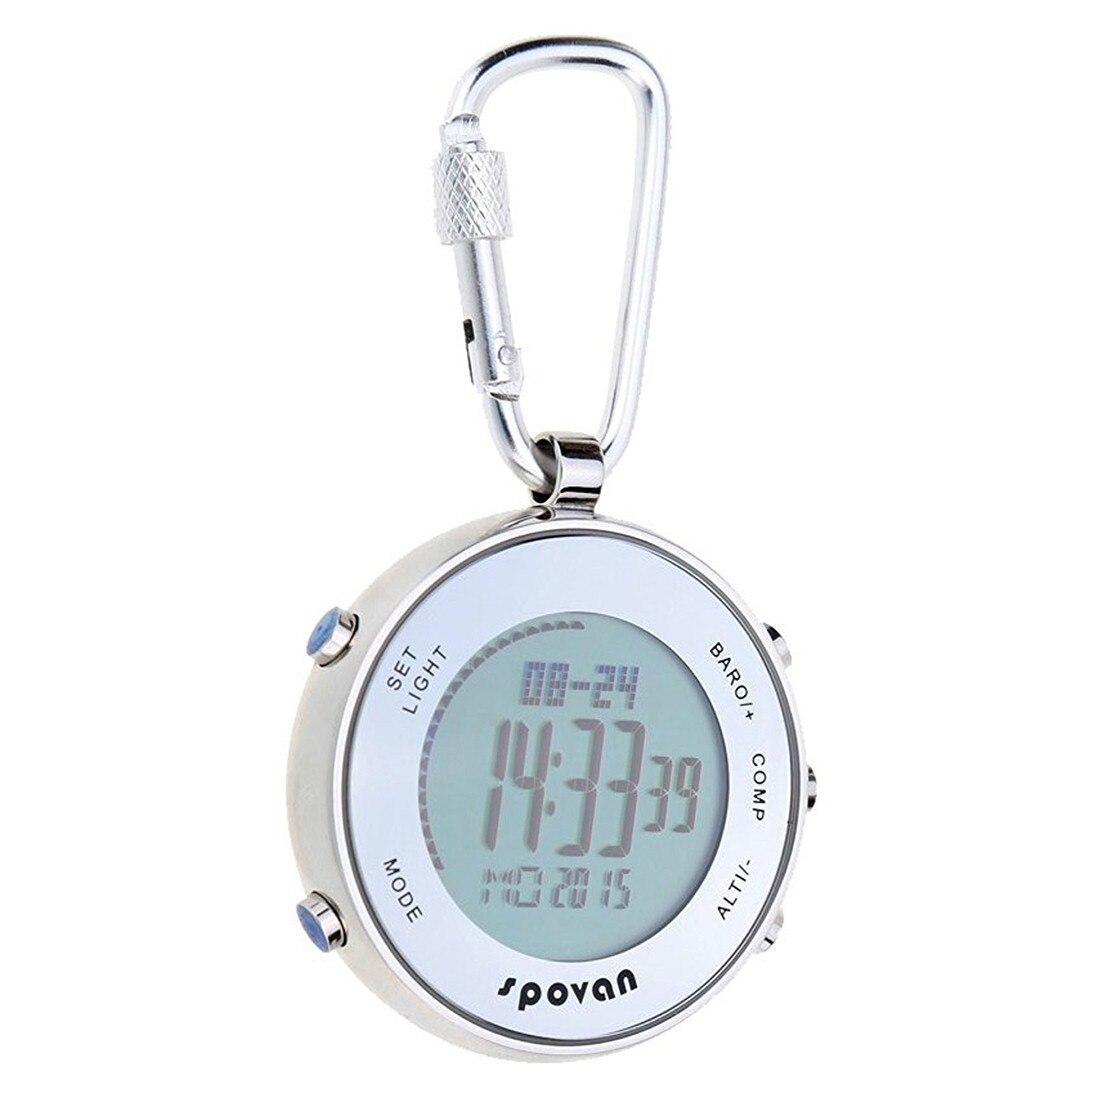 SPOVAN Outdoor Sports Multifunctional Digital Pocket Watch with Carabiner Hook & Elastic Rope цена и фото